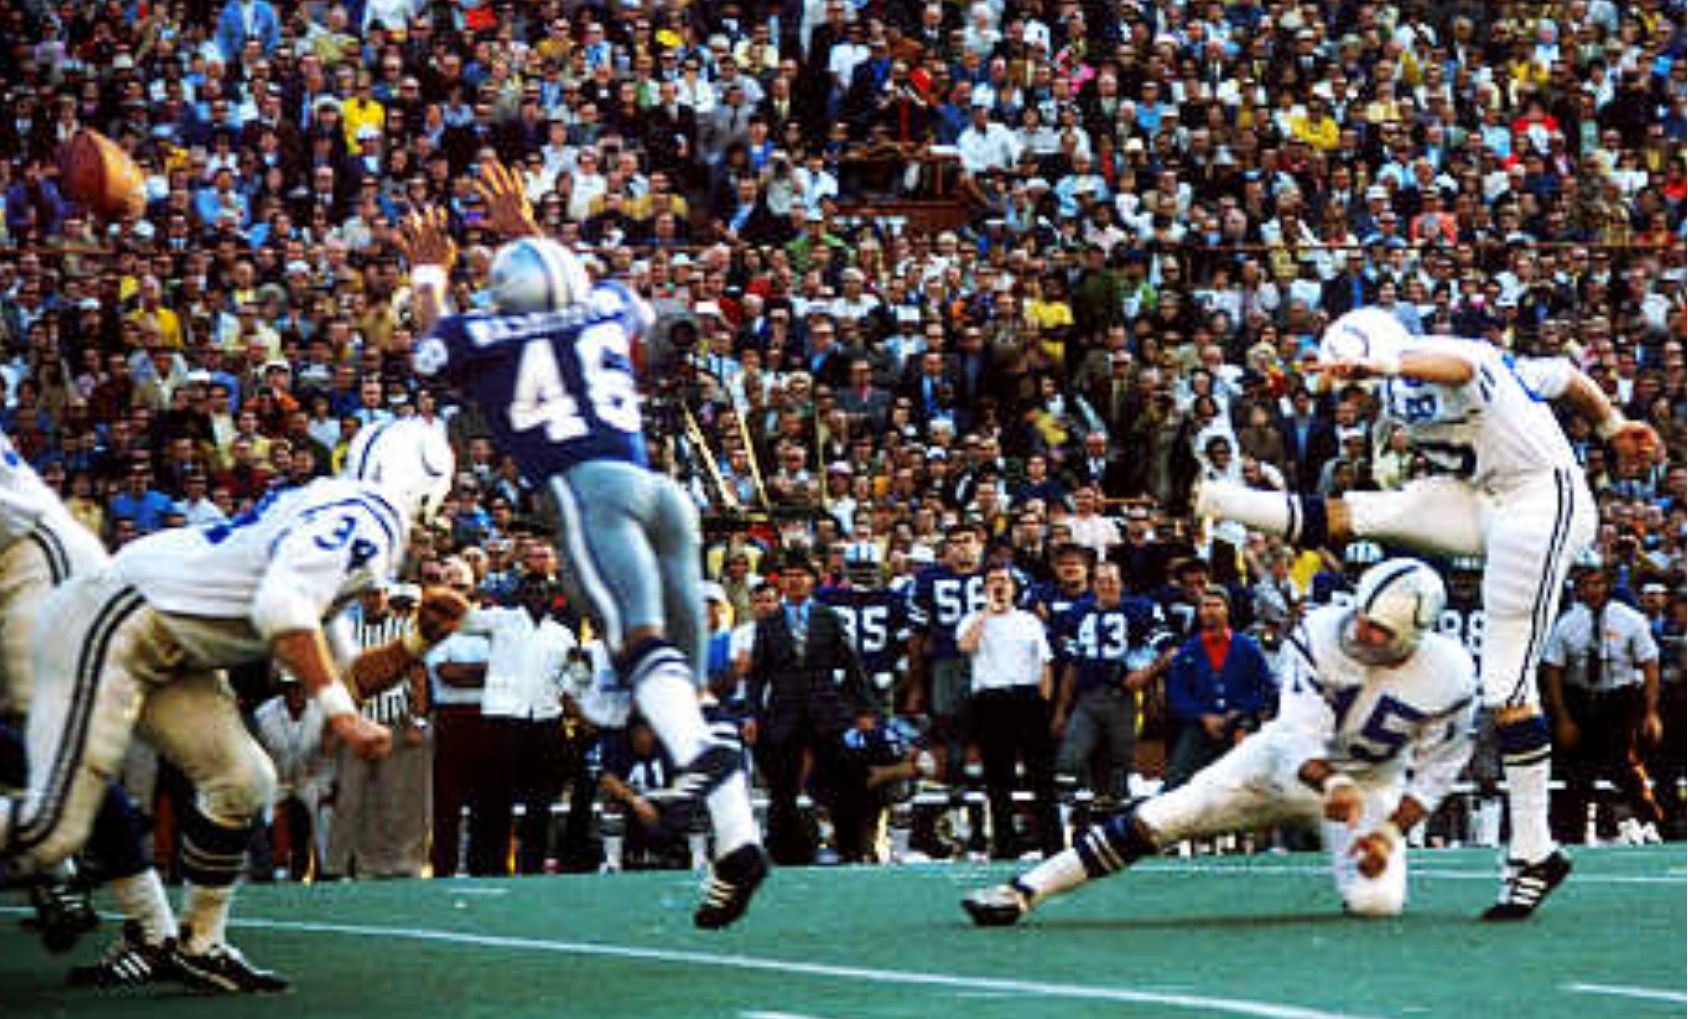 The Baltimore Colts battle in Super Bowl V | Source: The Baltimore Gridiron Report The Baltimore Colts battle the Dallas Cowboys in Super Bowl V.